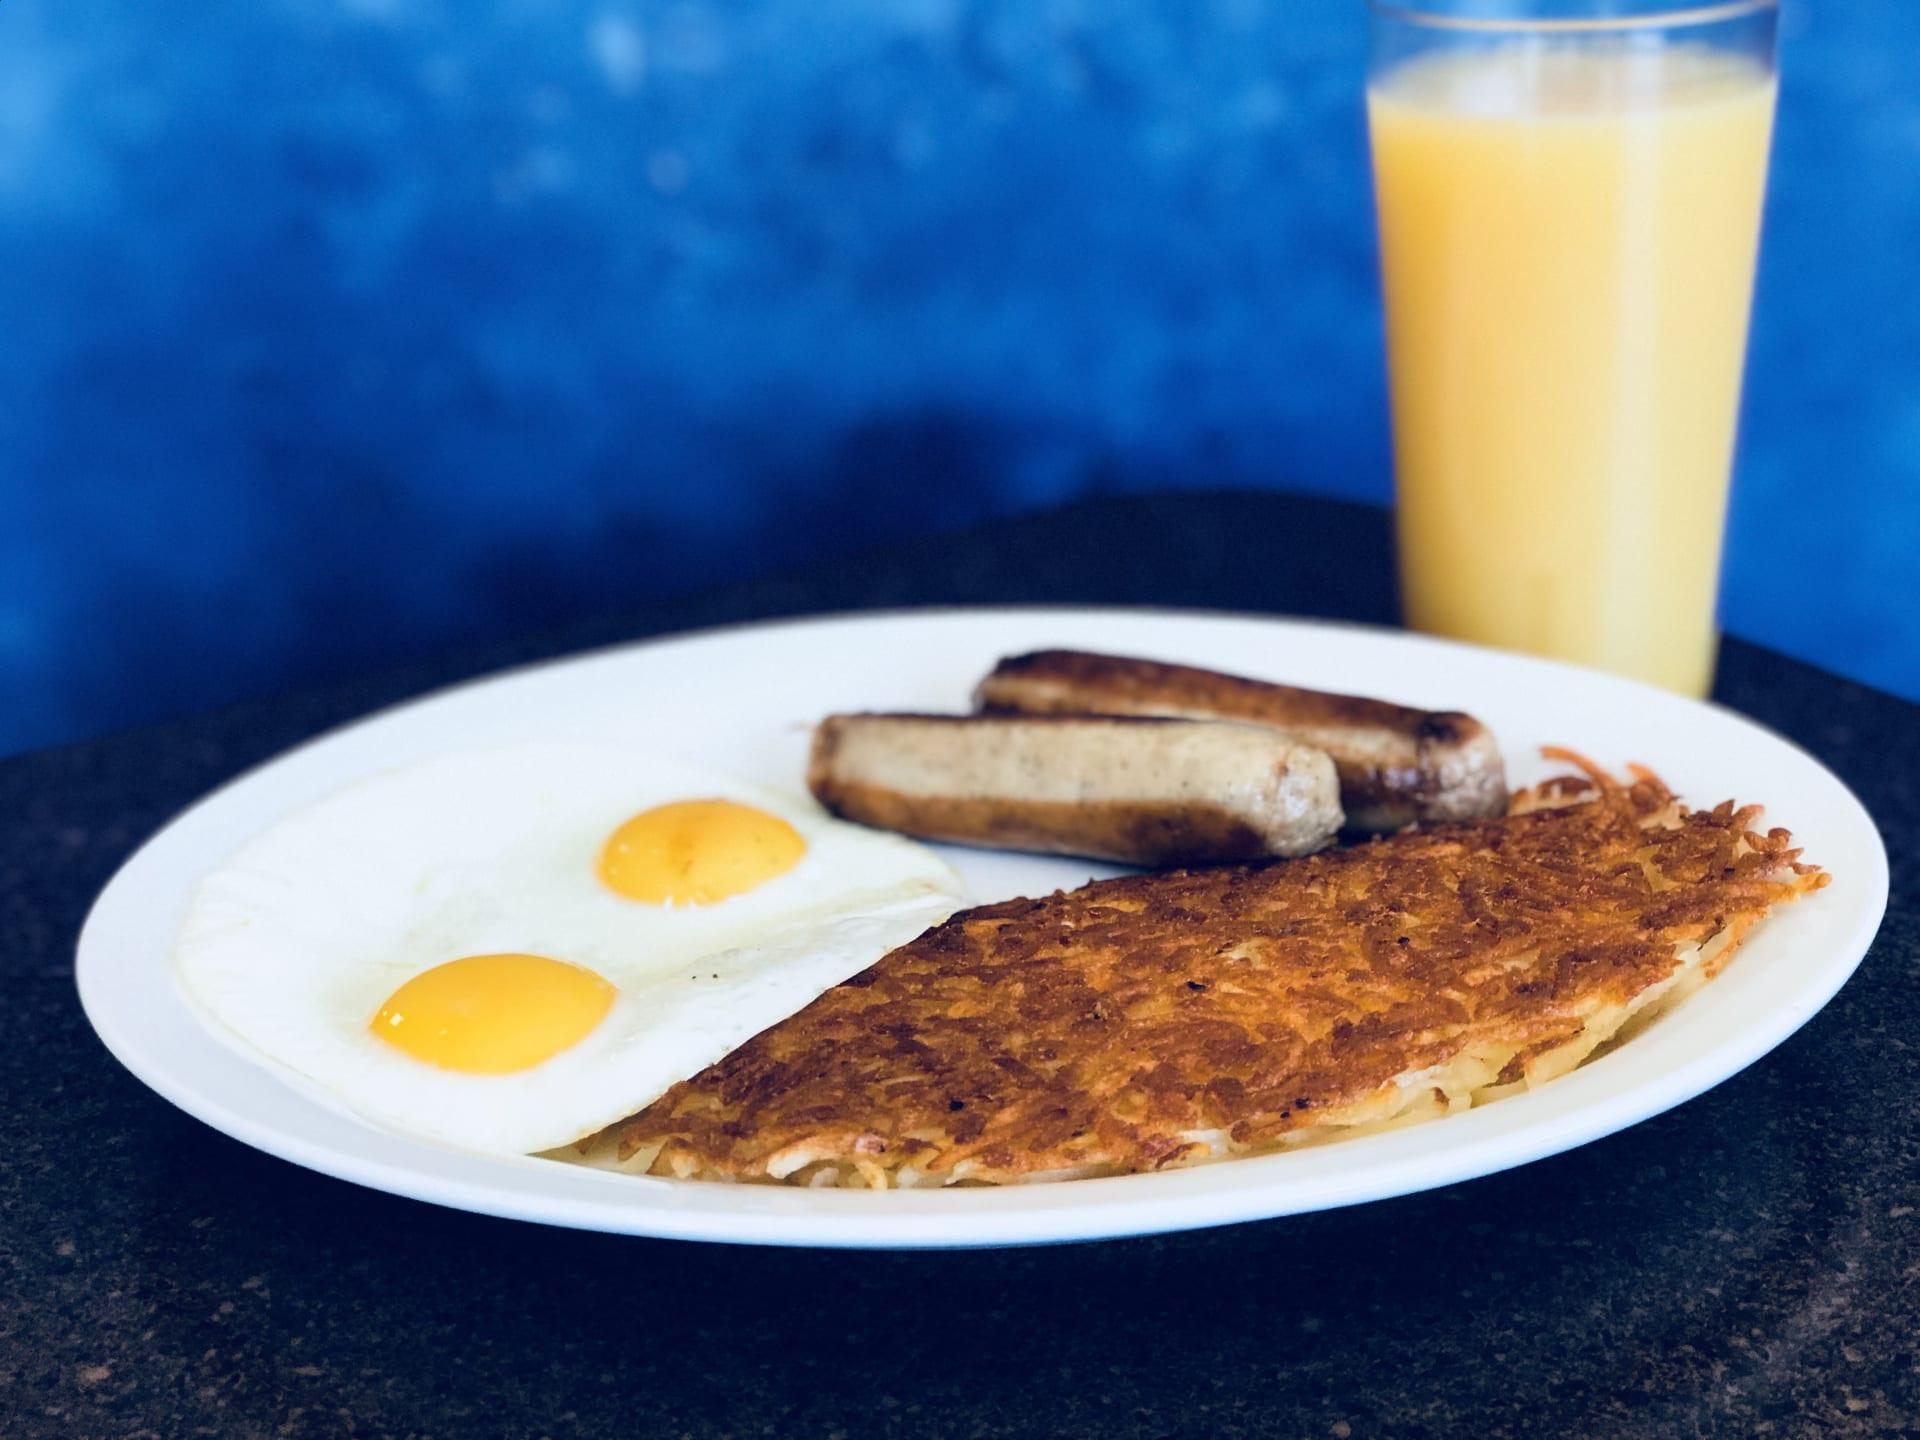 Bacon, Sausage Links Or Sausage Patty and Eggs